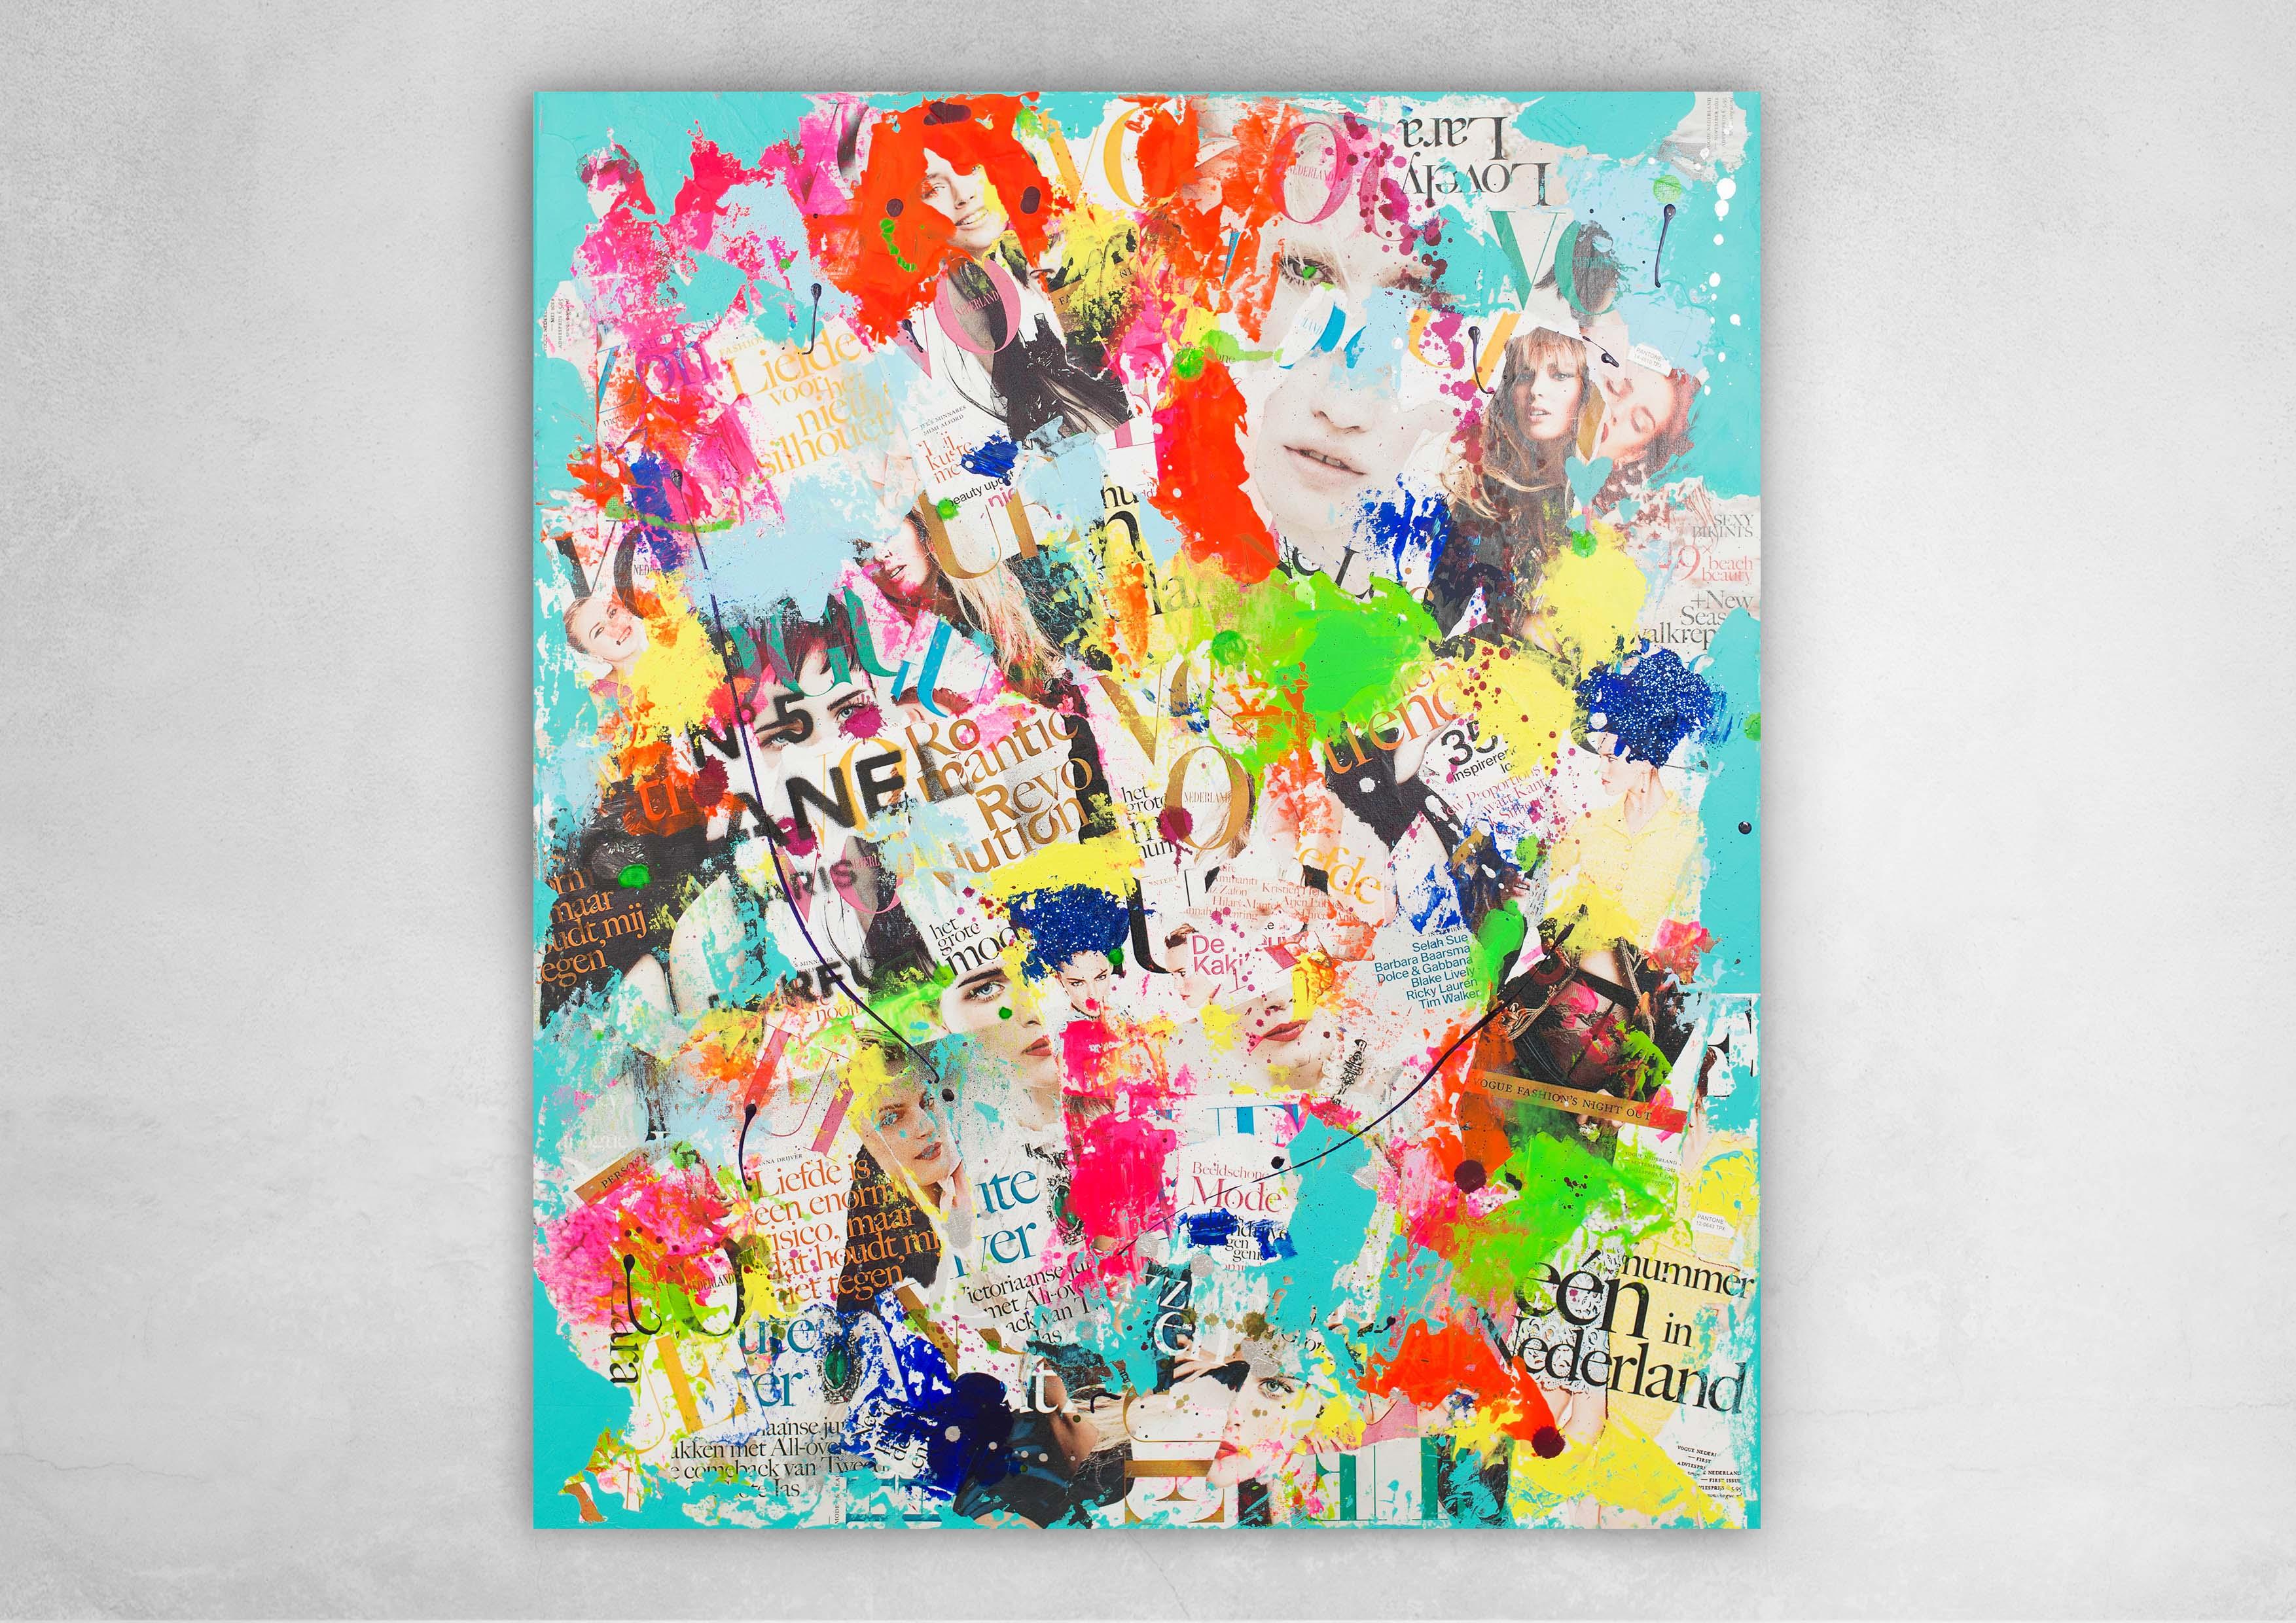 ART_MIXED-MEDIA_NEONIC_REVOLUTION_CANVAS_WALL